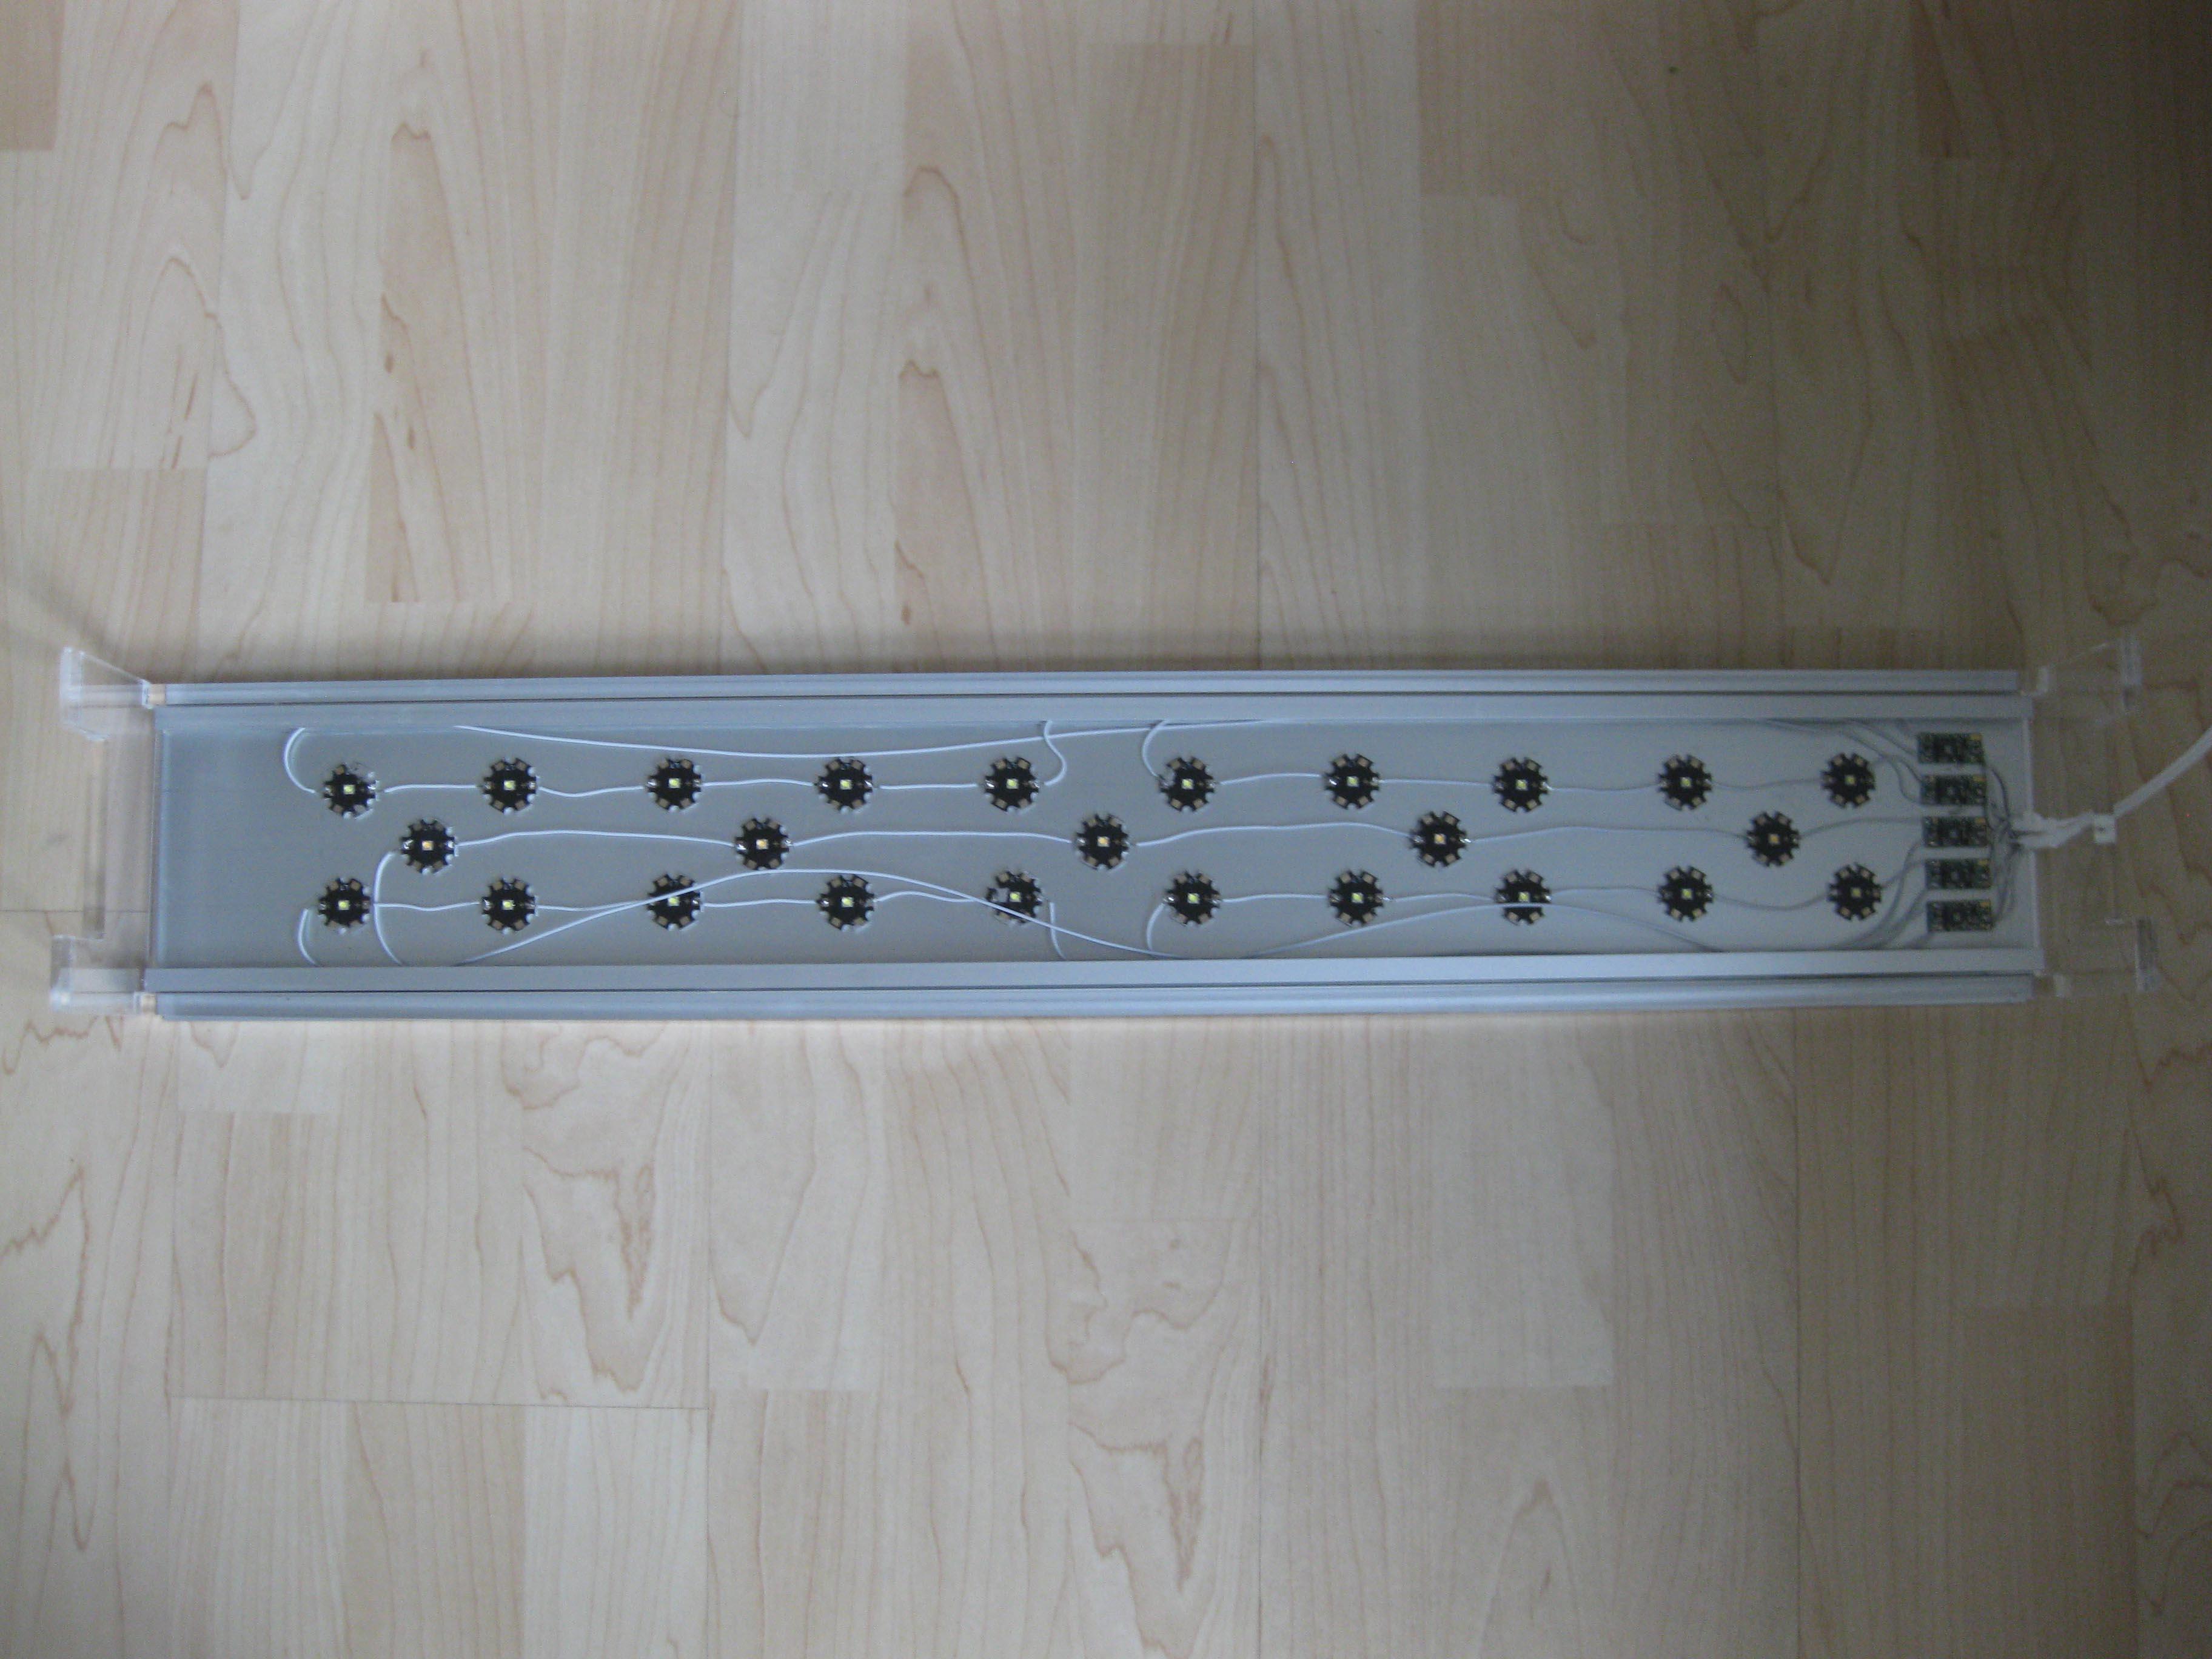 Led Wohnzimmerlampe Selber Bauen DIY LED Lampe Seite